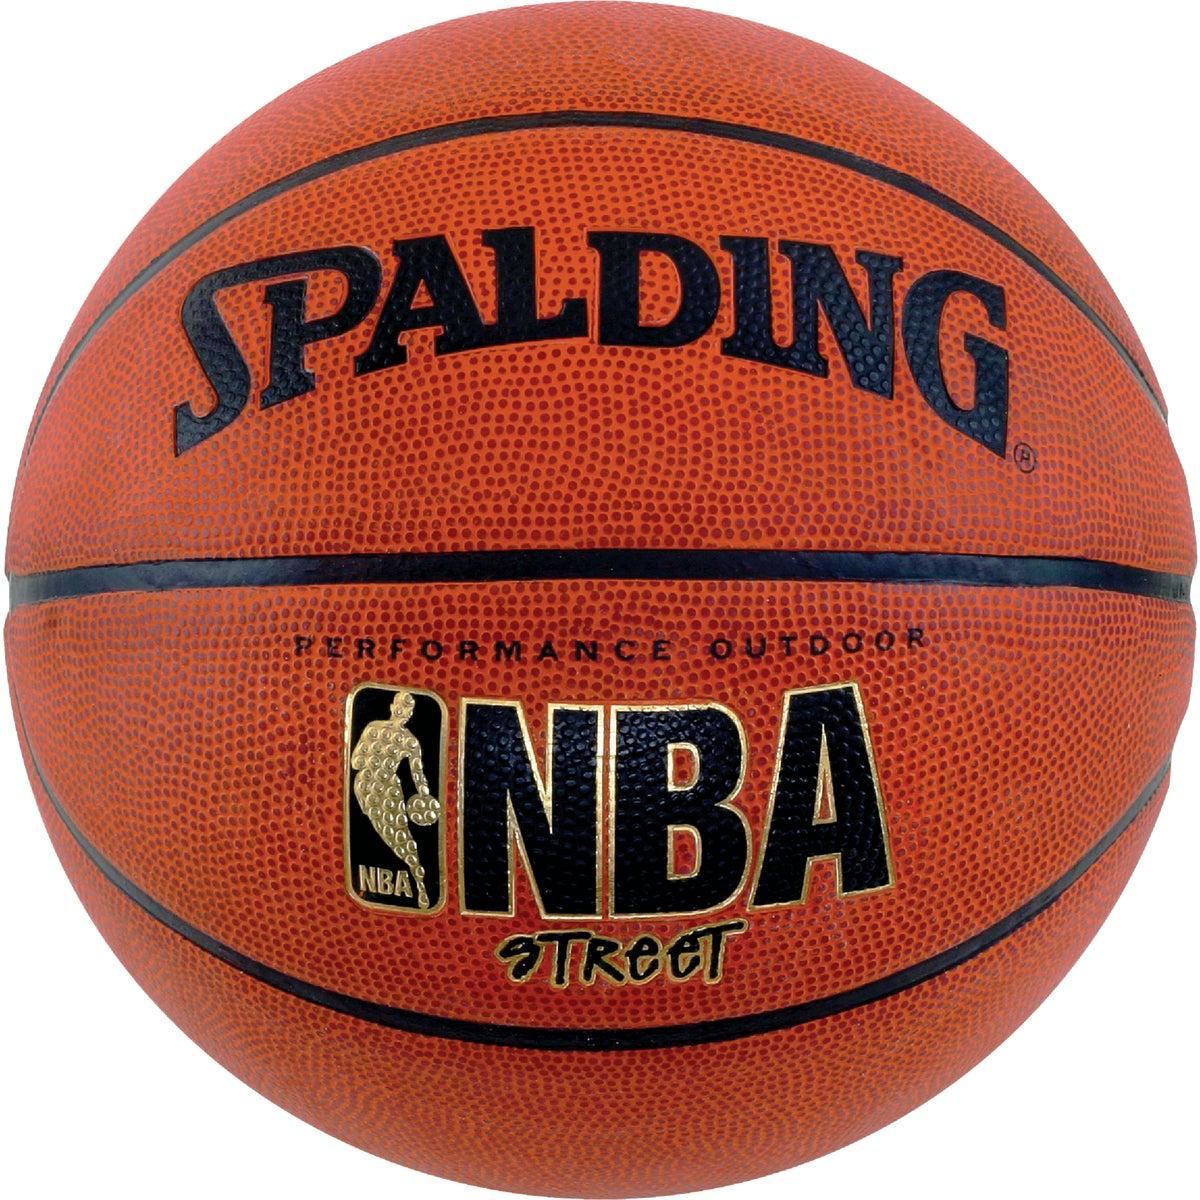 29.5 STREET BASKETBALL